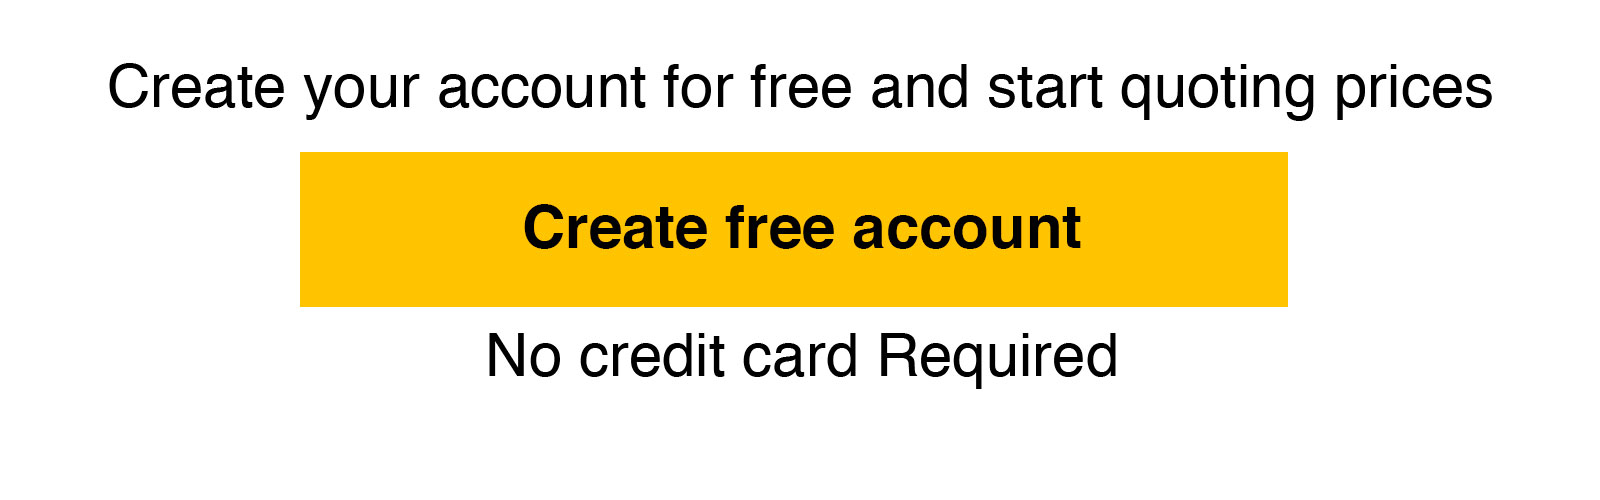 Create Free Account